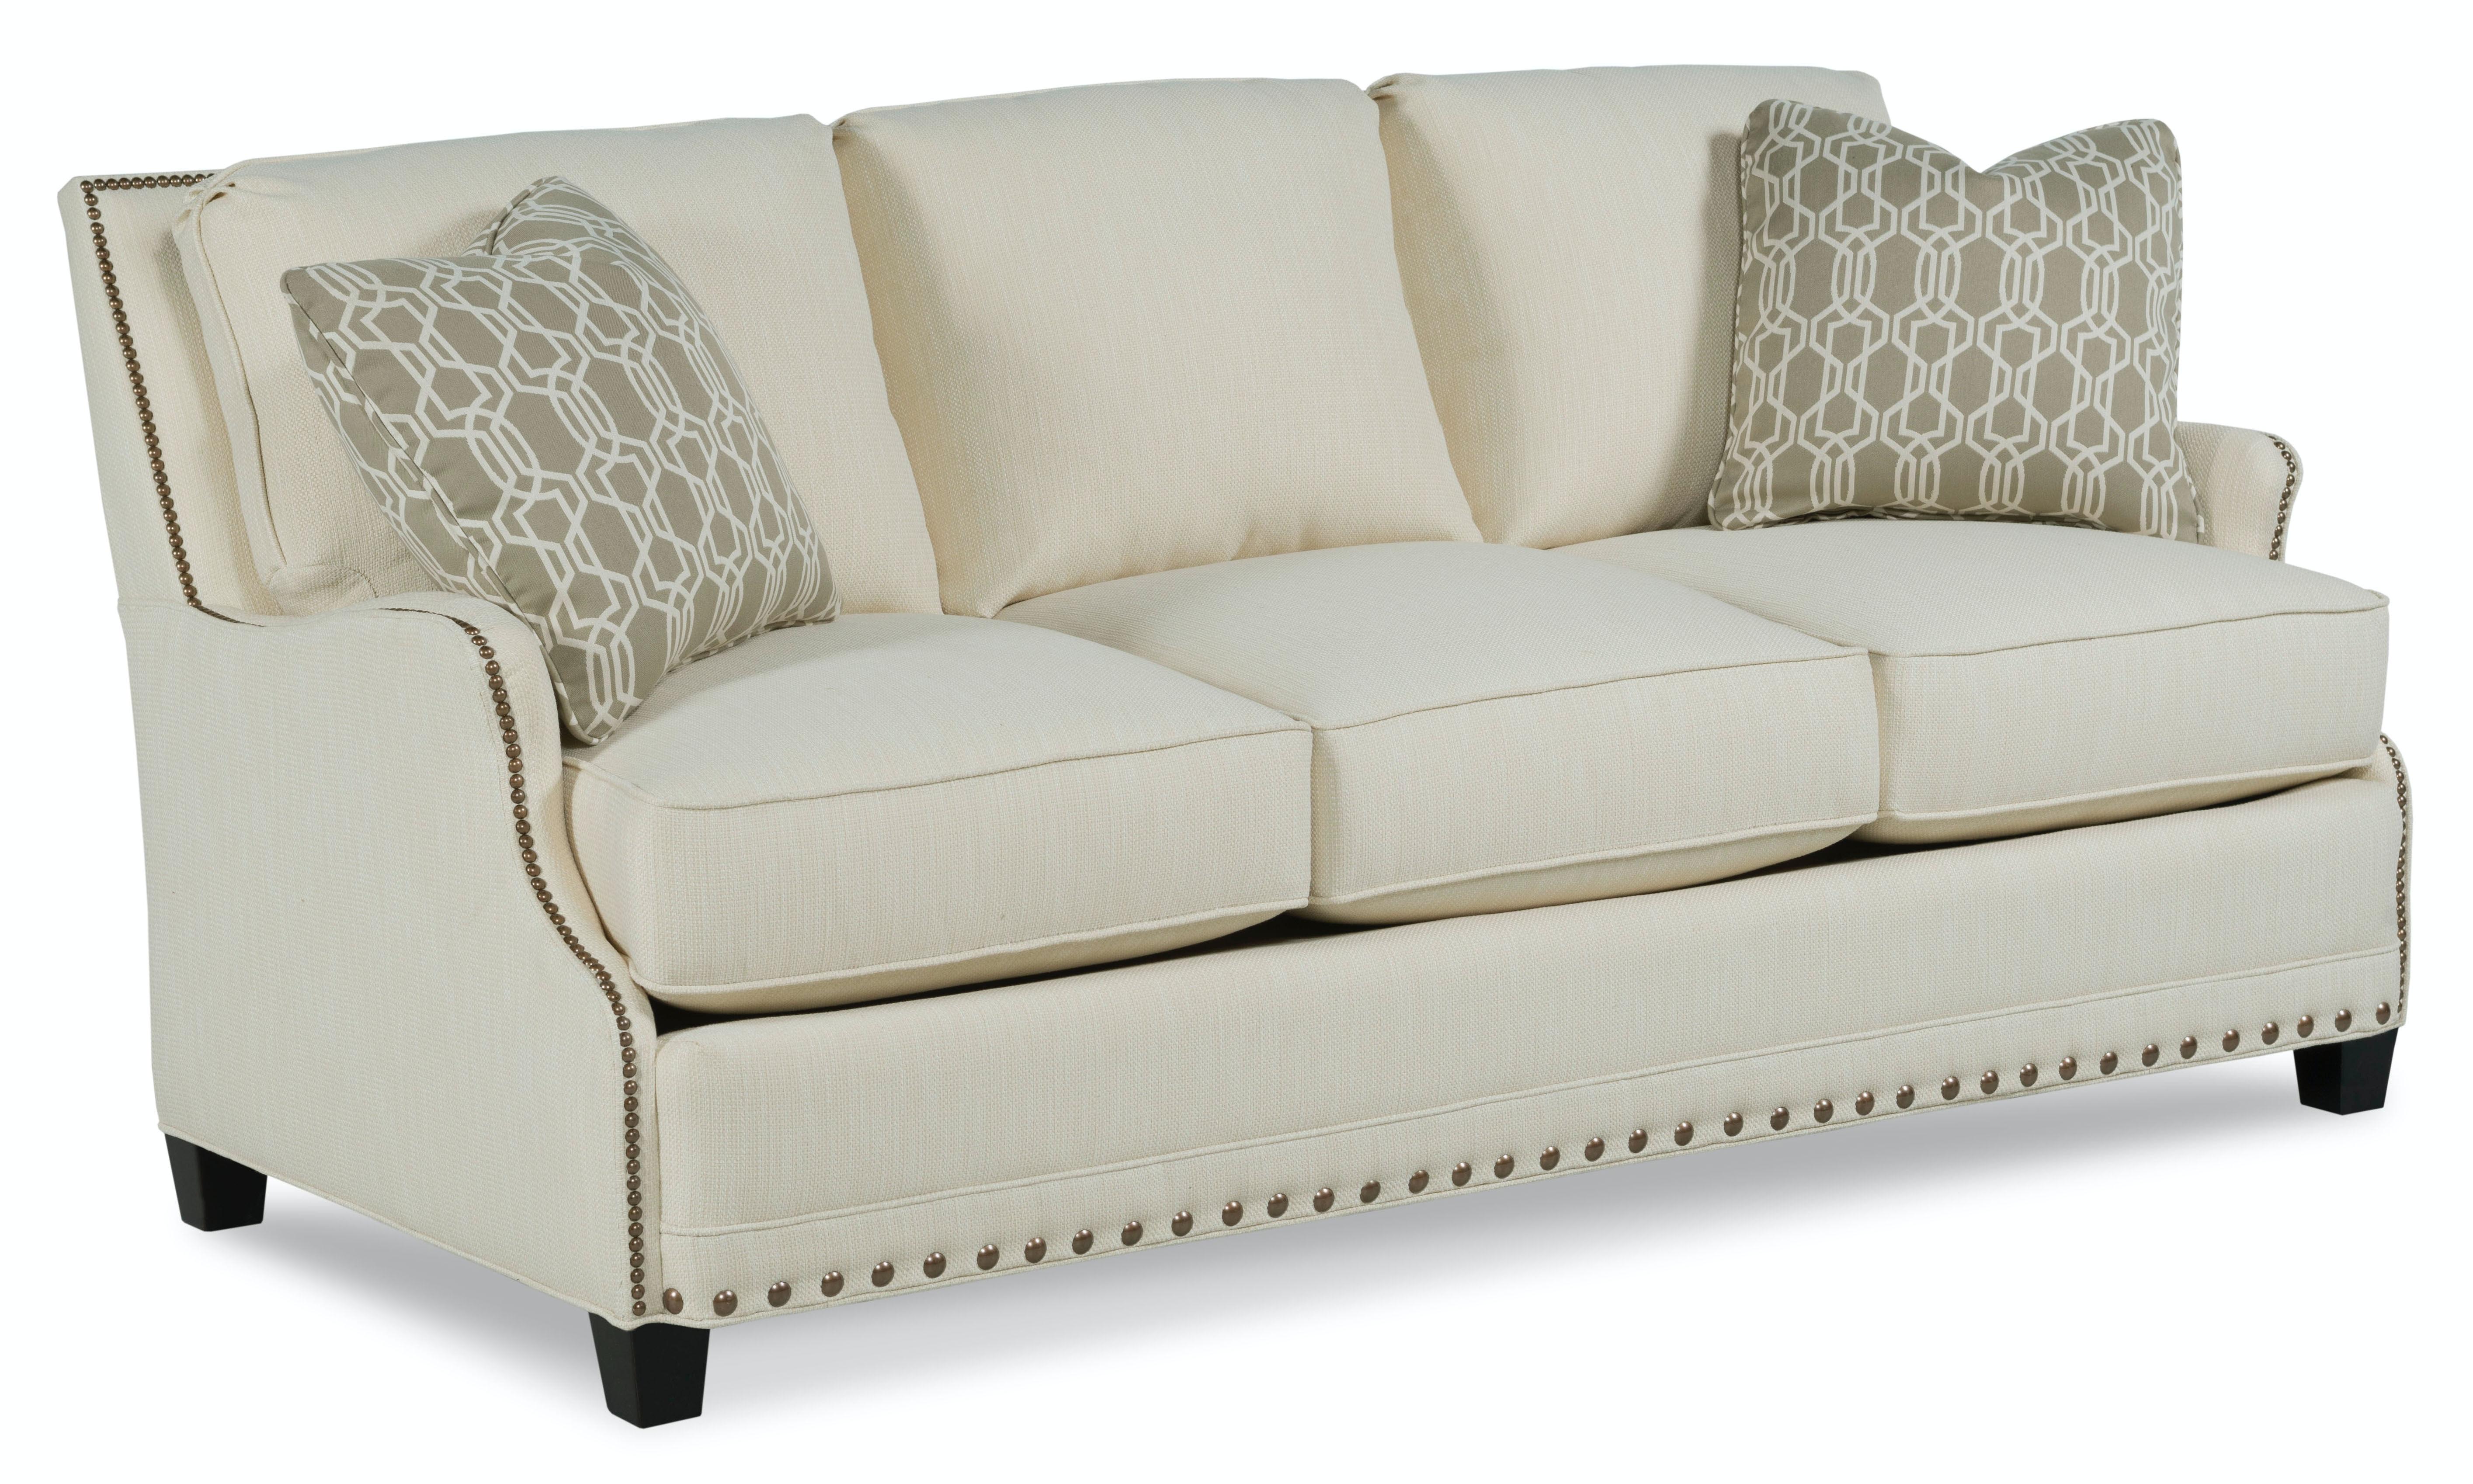 Fairfield Chair pany Living Room Sofa 2772 50 Cherry